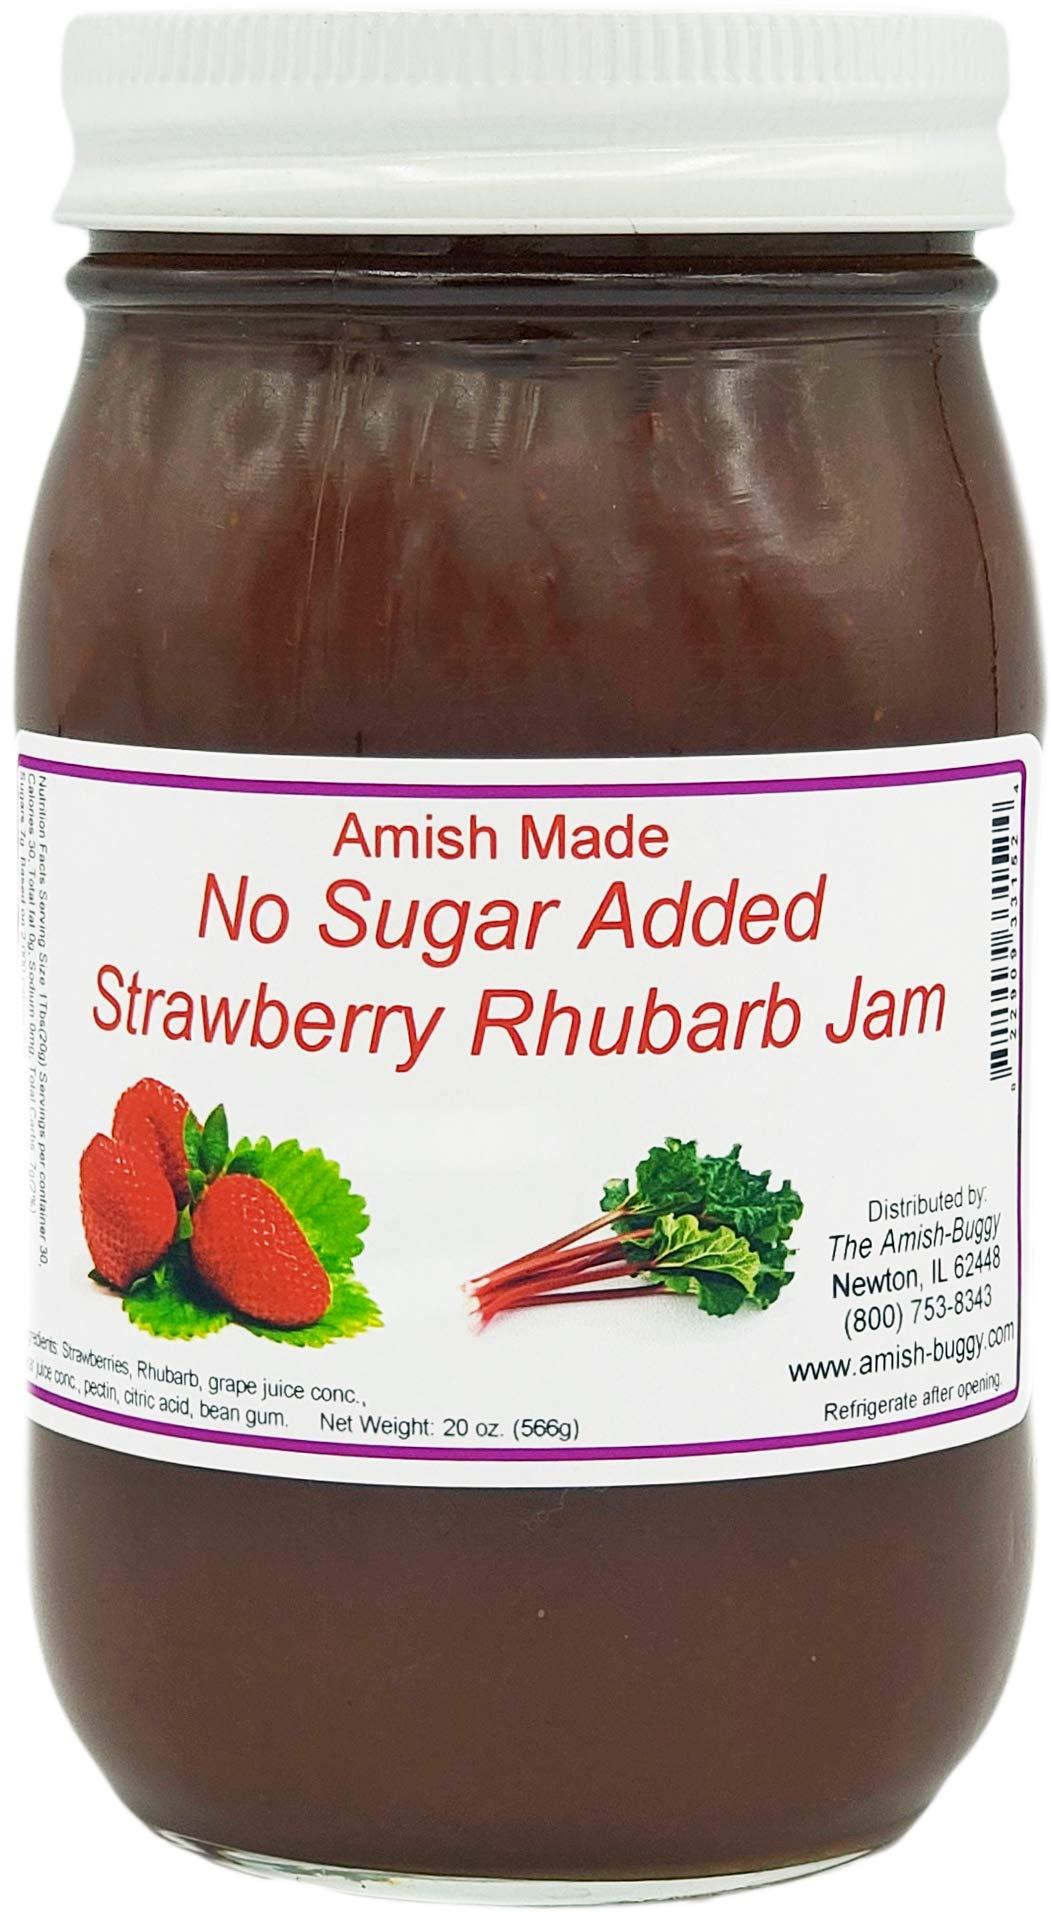 Amish Strawberry/Rhubarb Jam - No Sugar Added - Two 16 Oz Jars